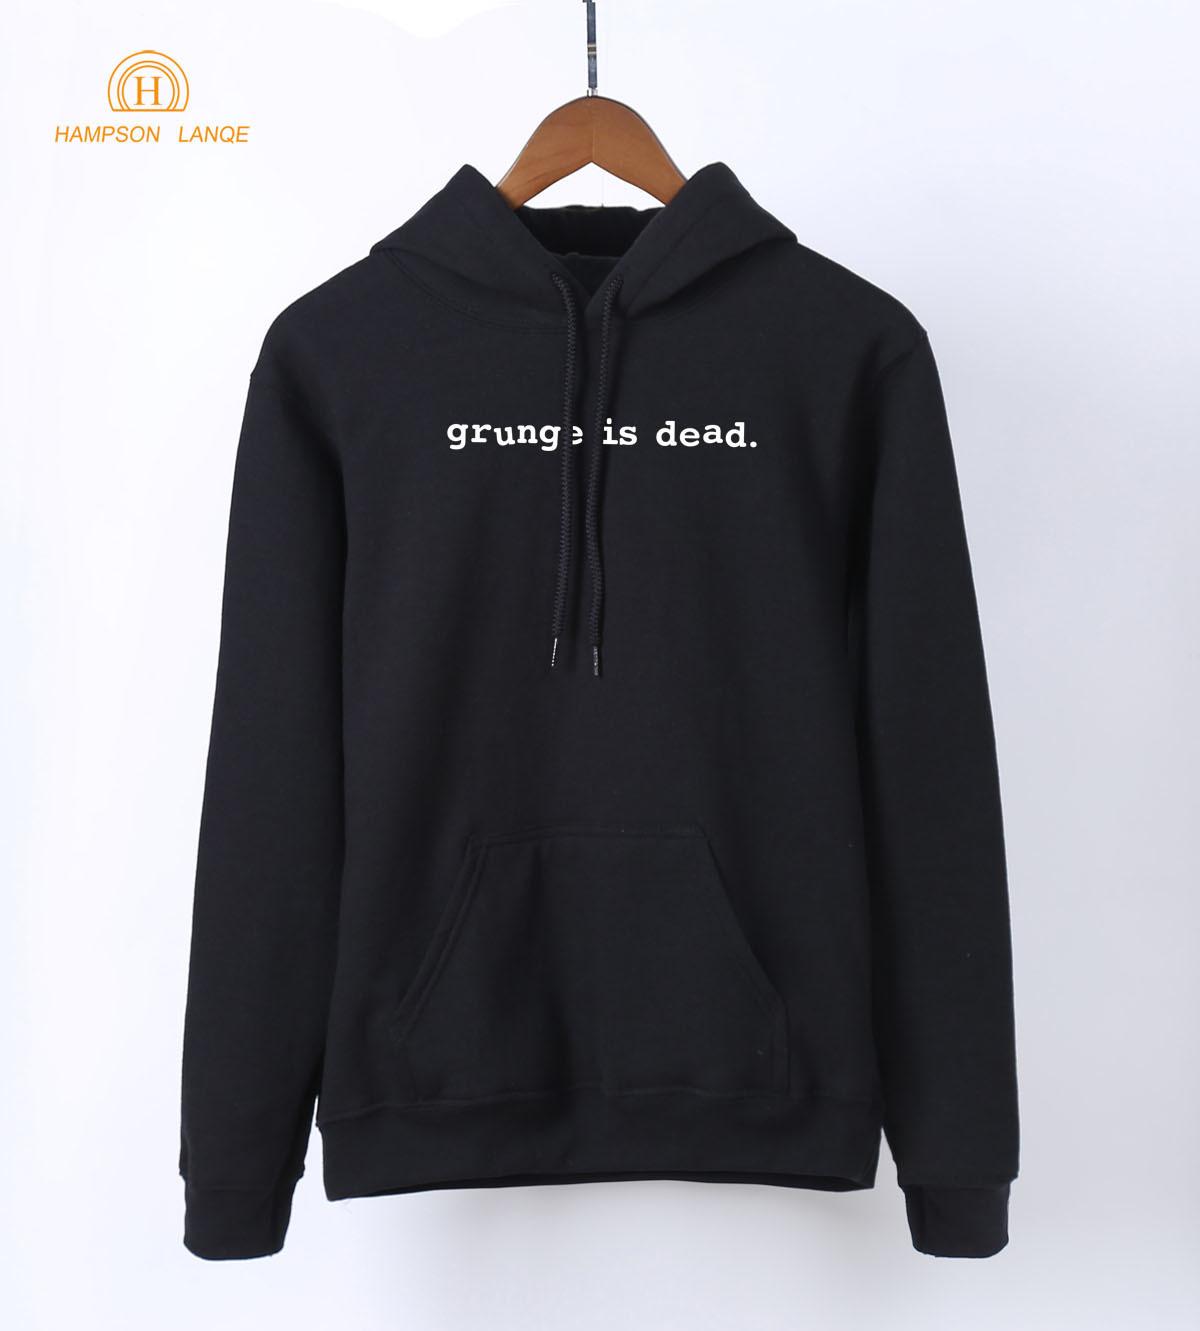 Grunge Is Dead Rock Band Punk Hoodies Women 2019 Spring Autumn Hip Hop Sweatshirt Women